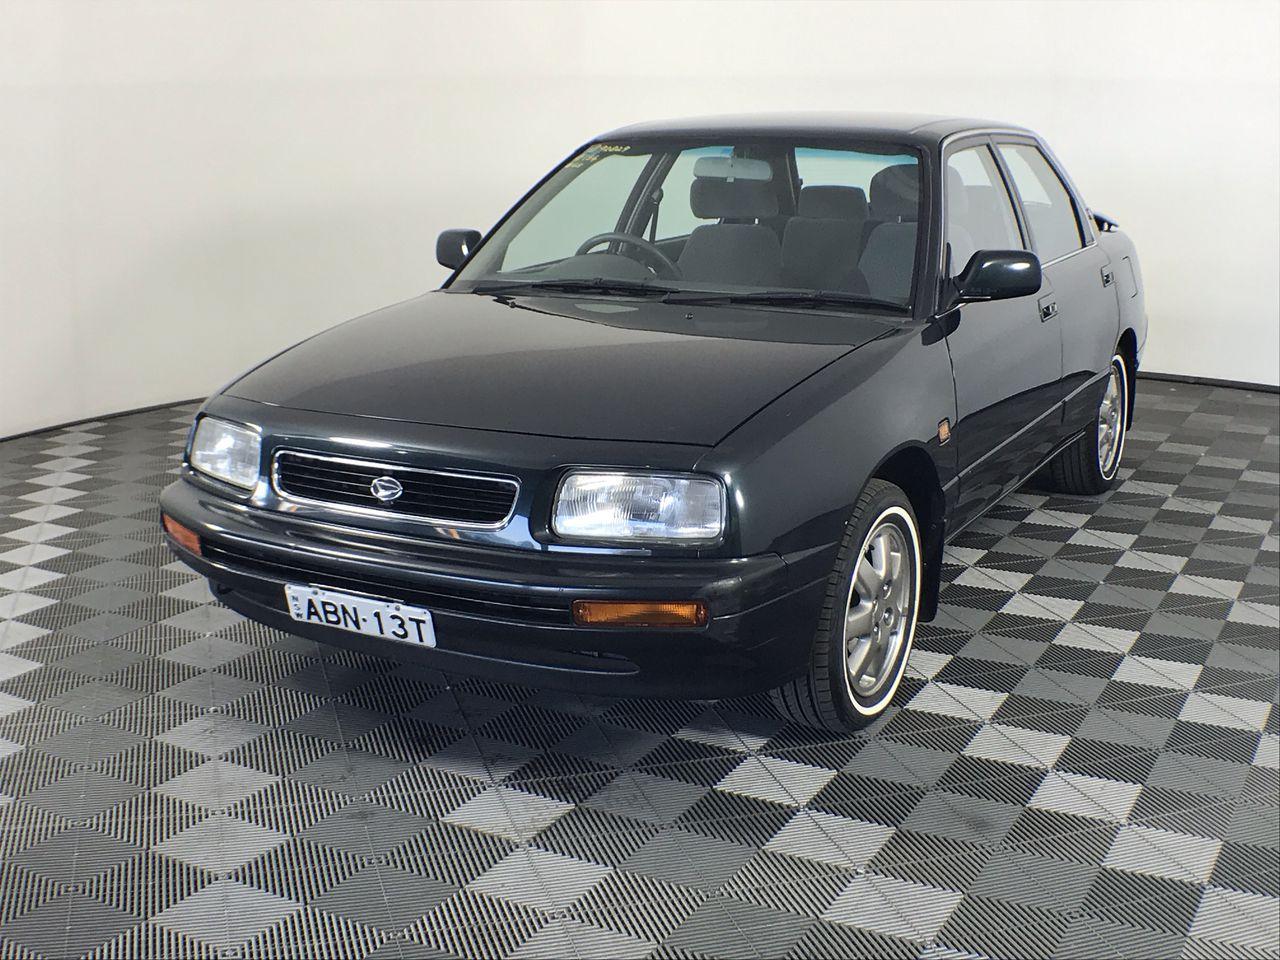 1993 Daihatsu Applause Executive A101 Automatic Sedan